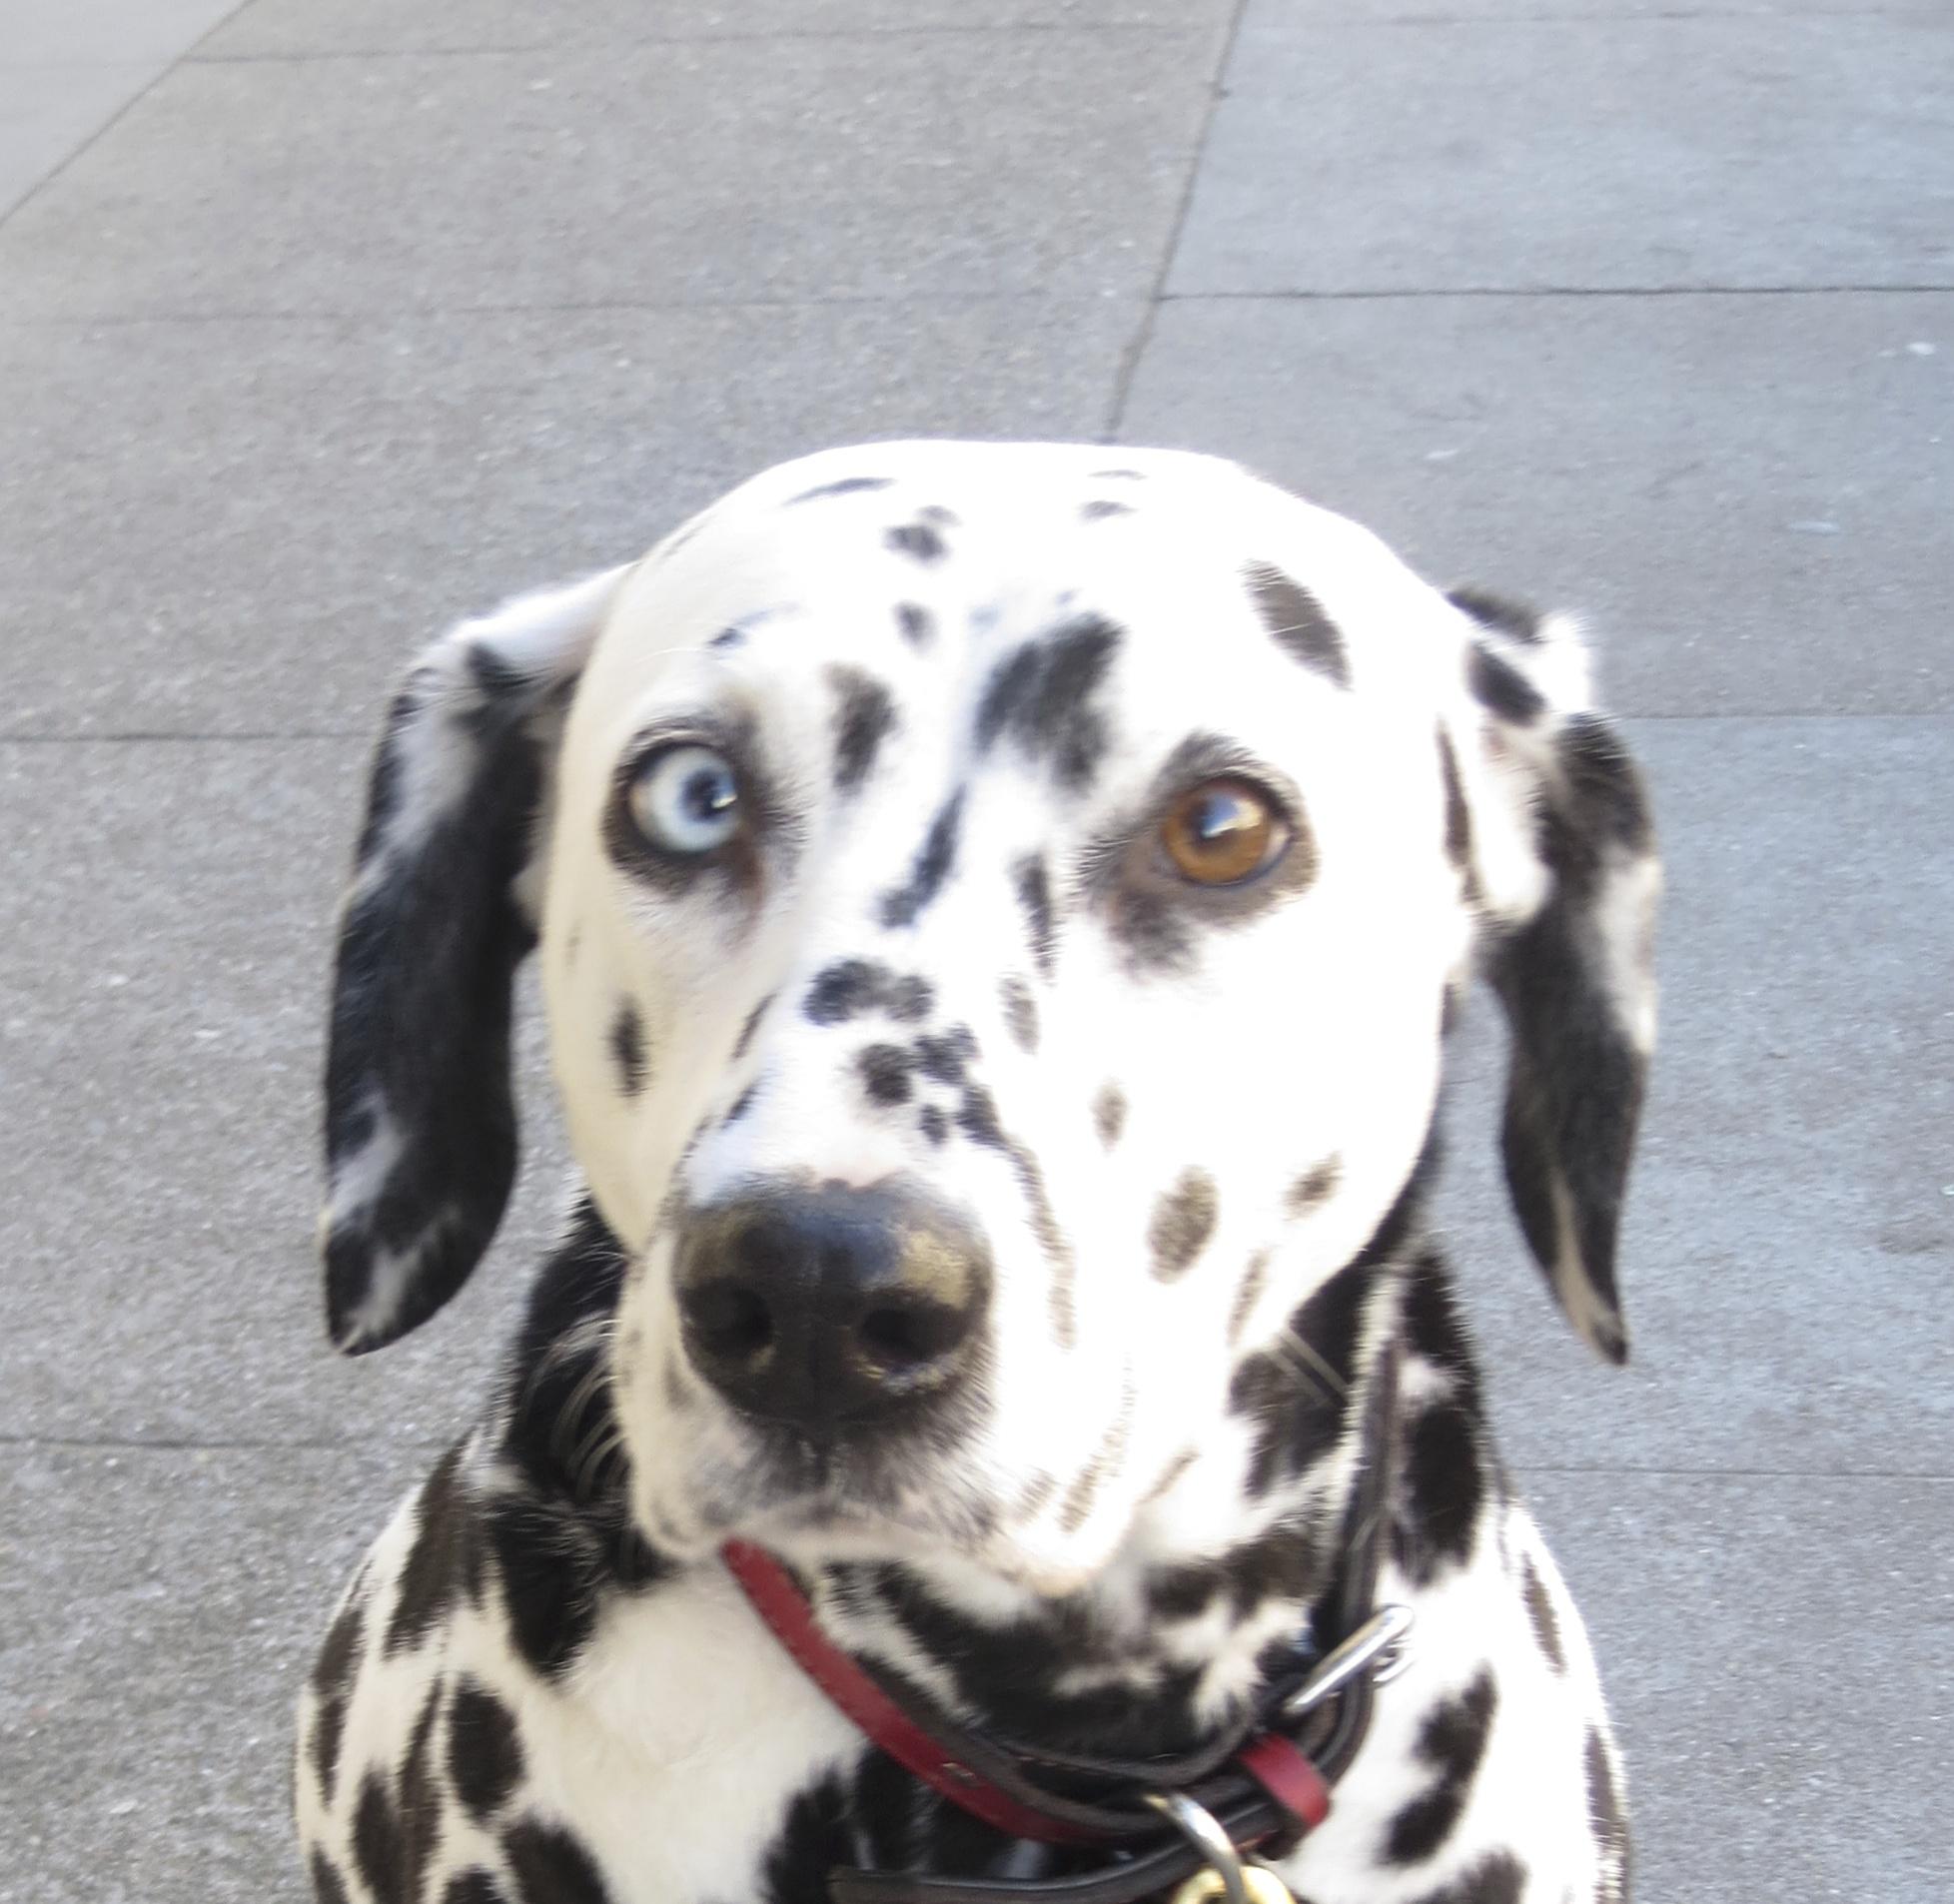 Dalmatian With Heterochromia